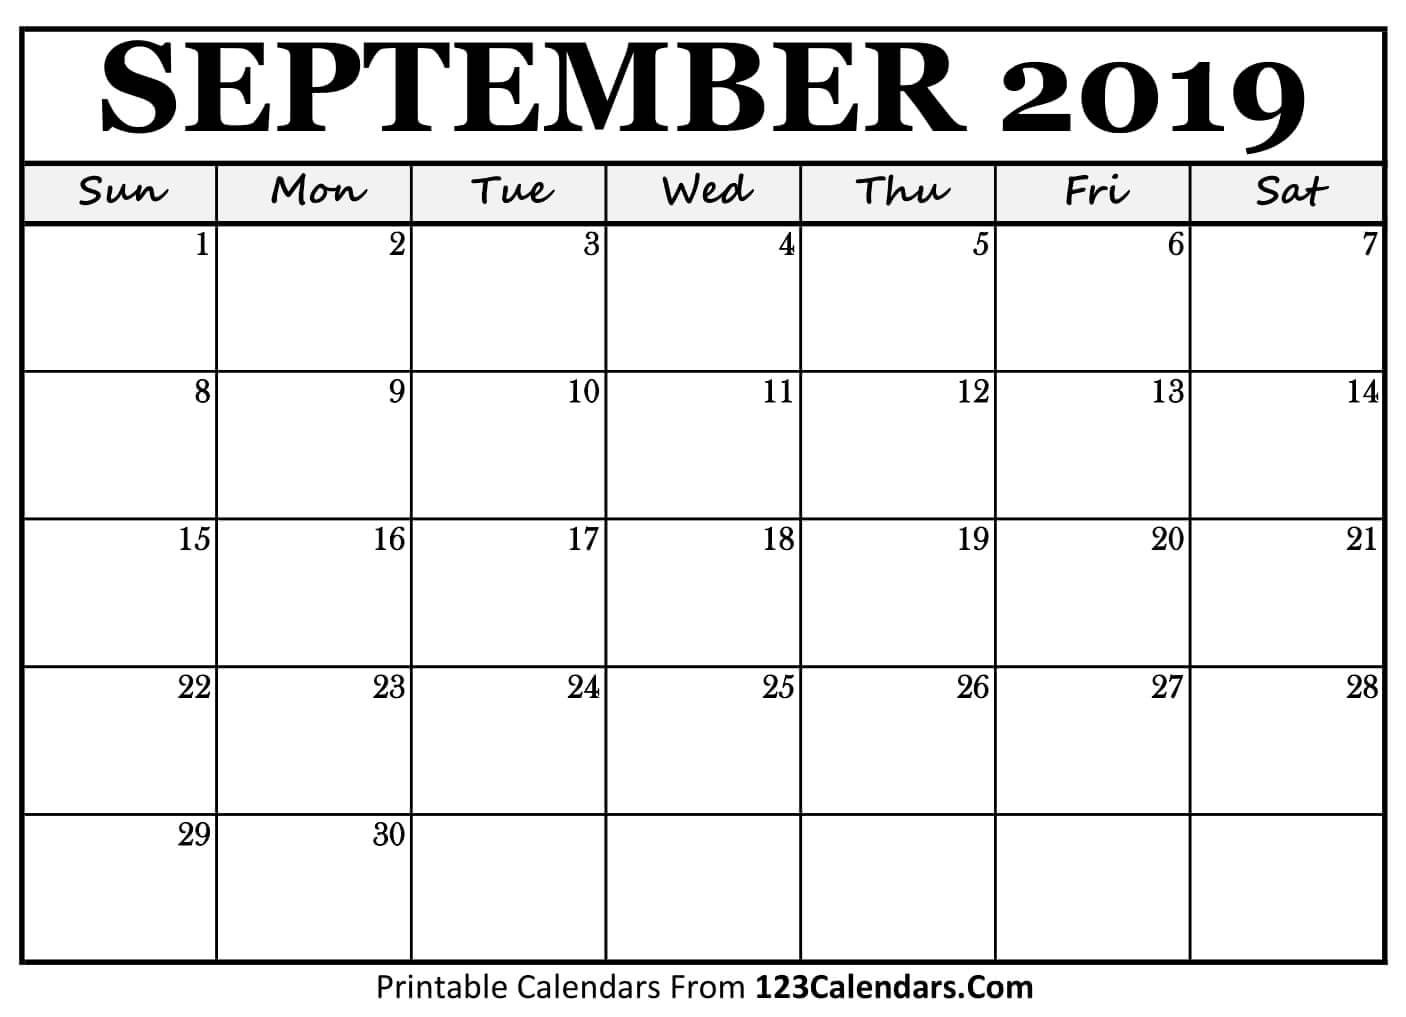 Printable Sept Calendar Printable September 2018 Calendar Templates 123calendars